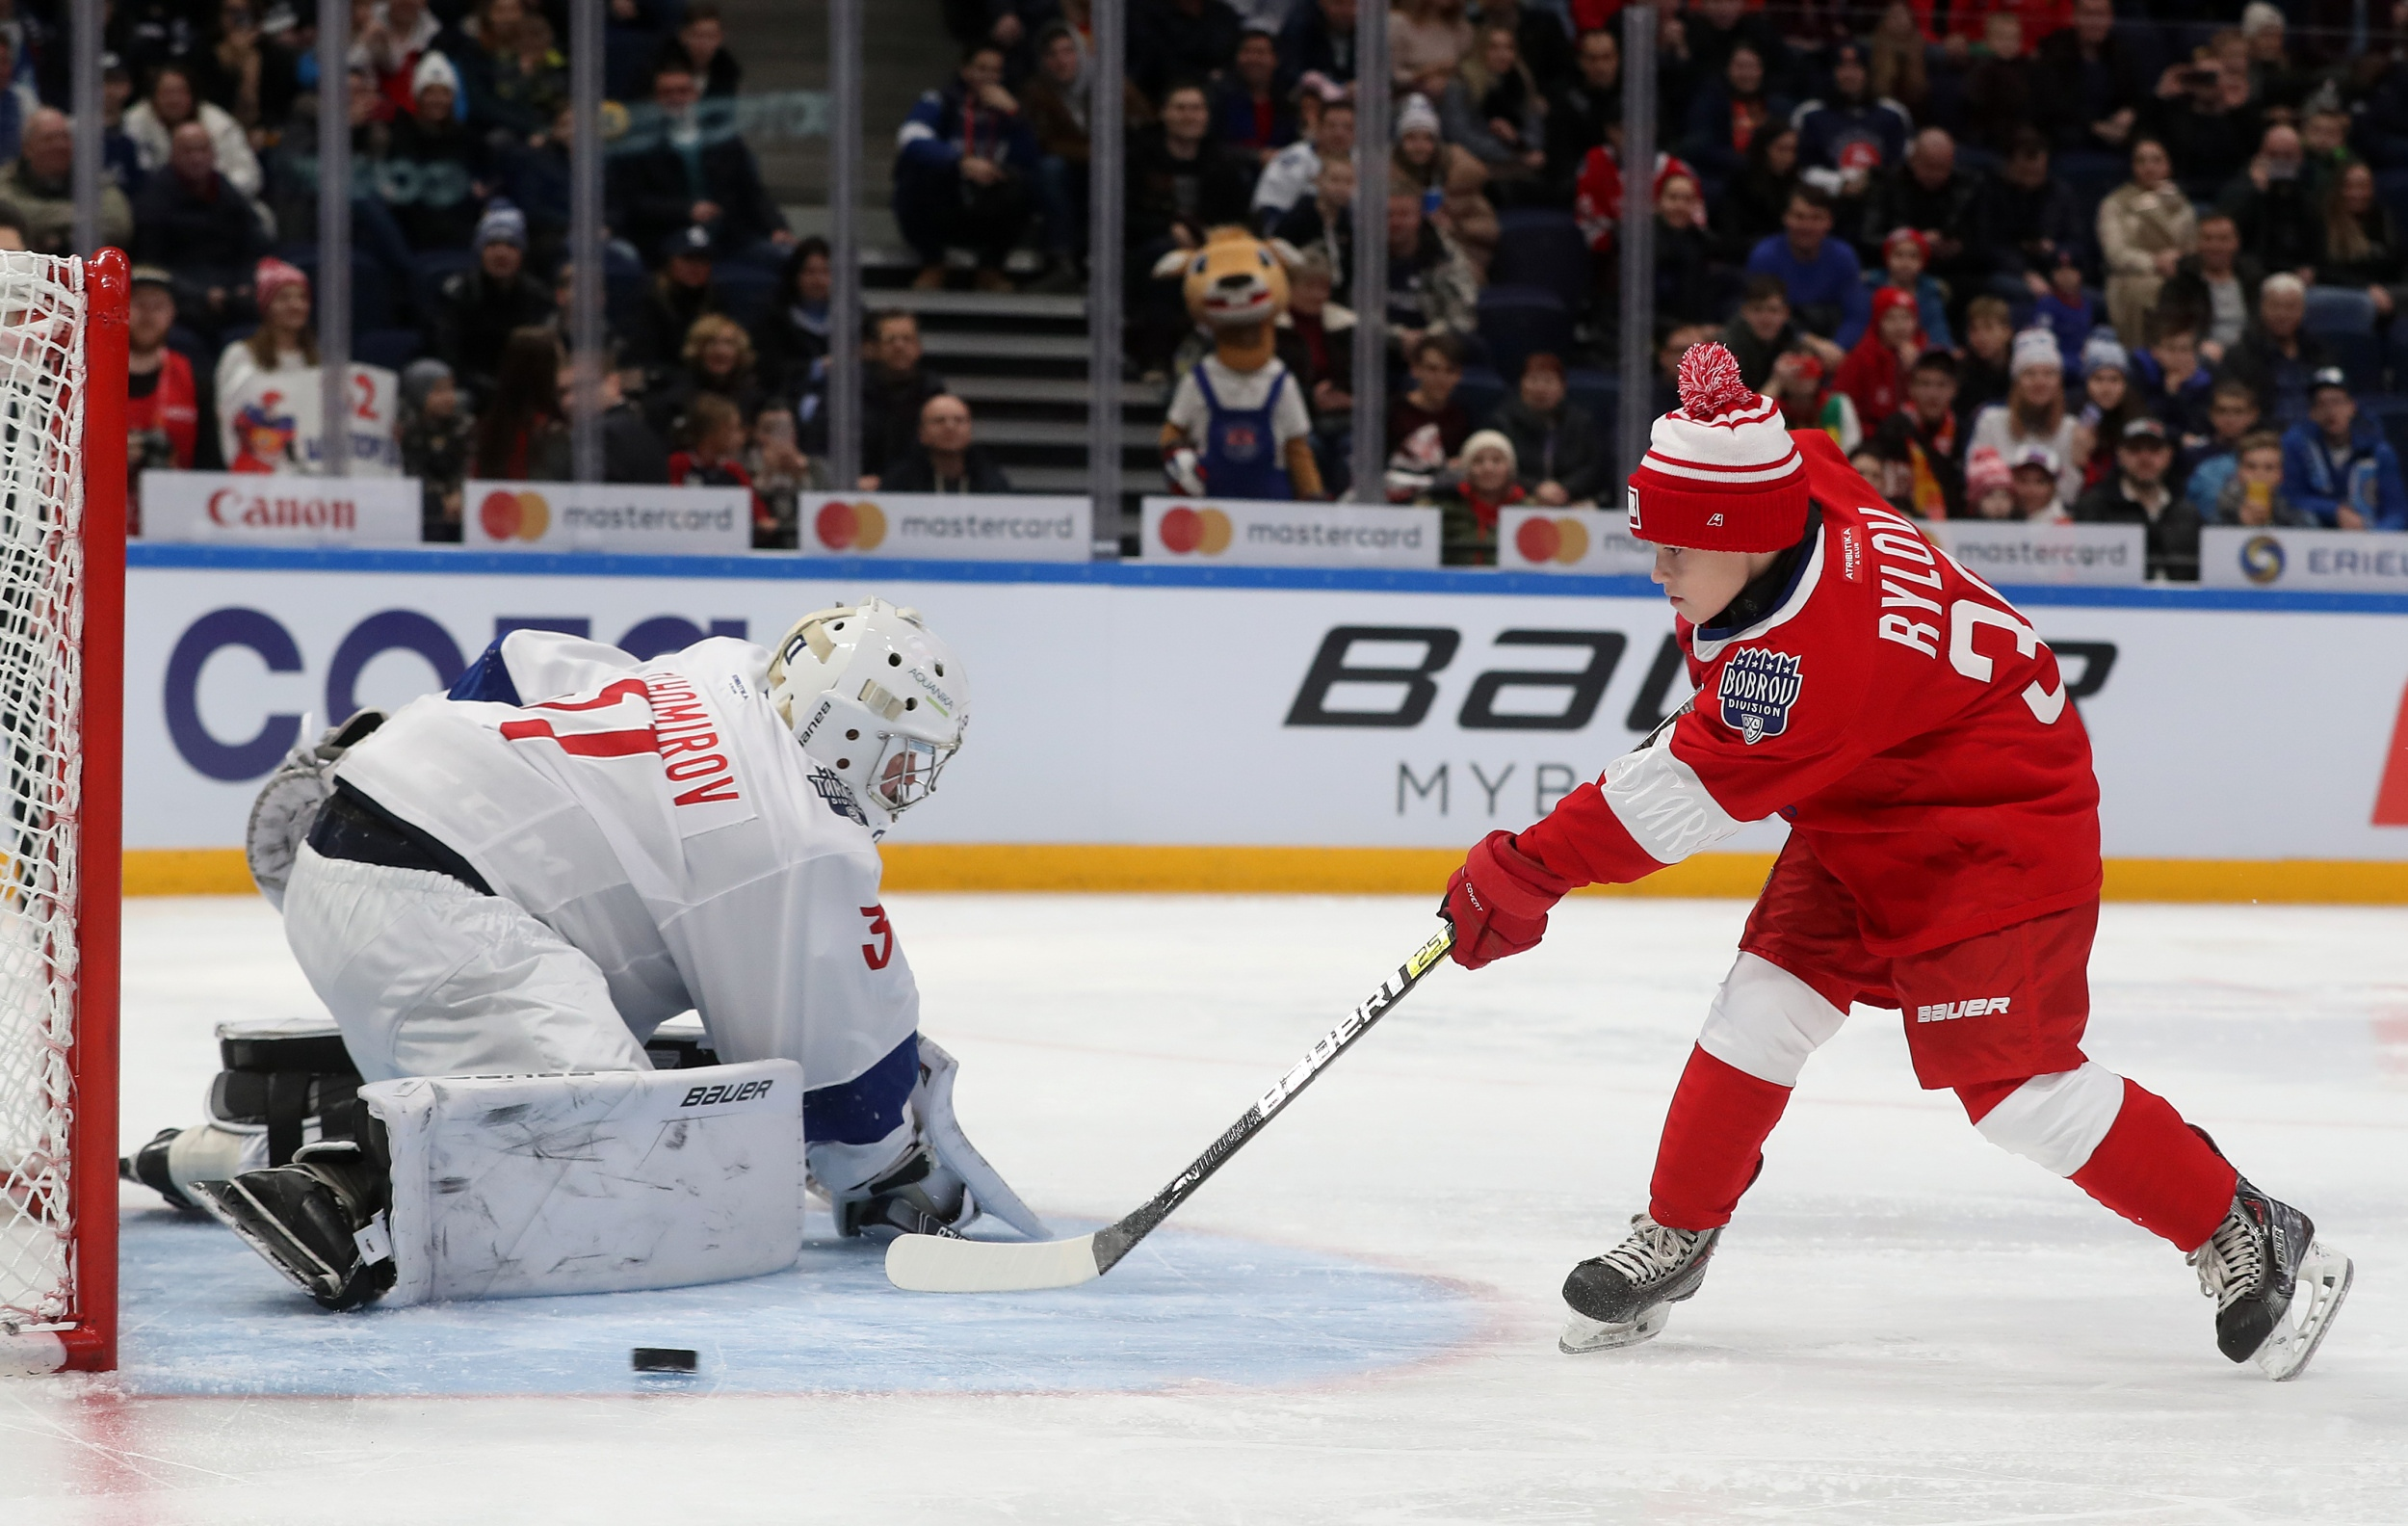 Сын Якова Рылова Ярослав забивает буллит на Матче Звезд КХЛ 2020